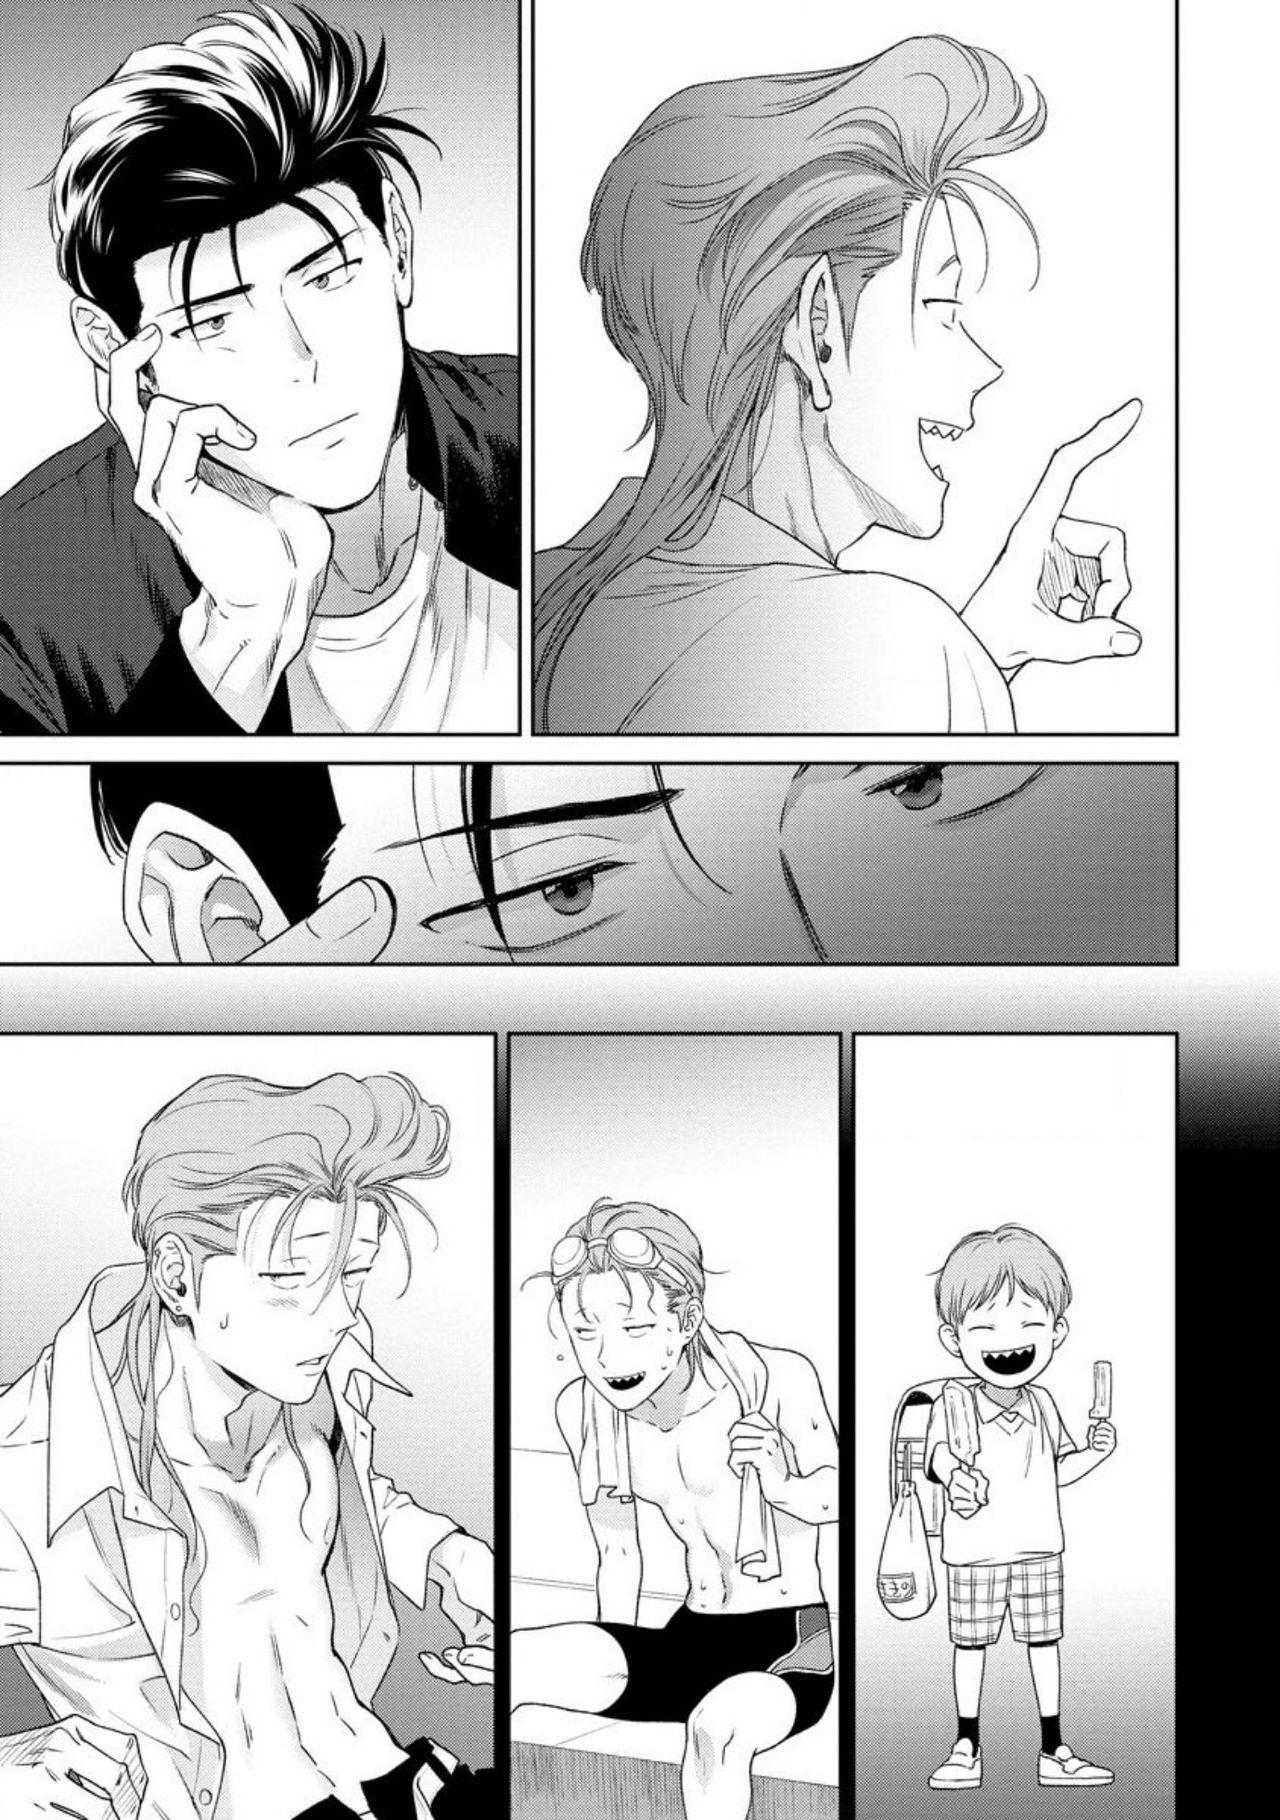 [Hiiragi Nozomu] Nakasete Yaru yo Yankee-kun   I'll Make You Cry Ch. 1-5 + Extras [English] [Digital] 142